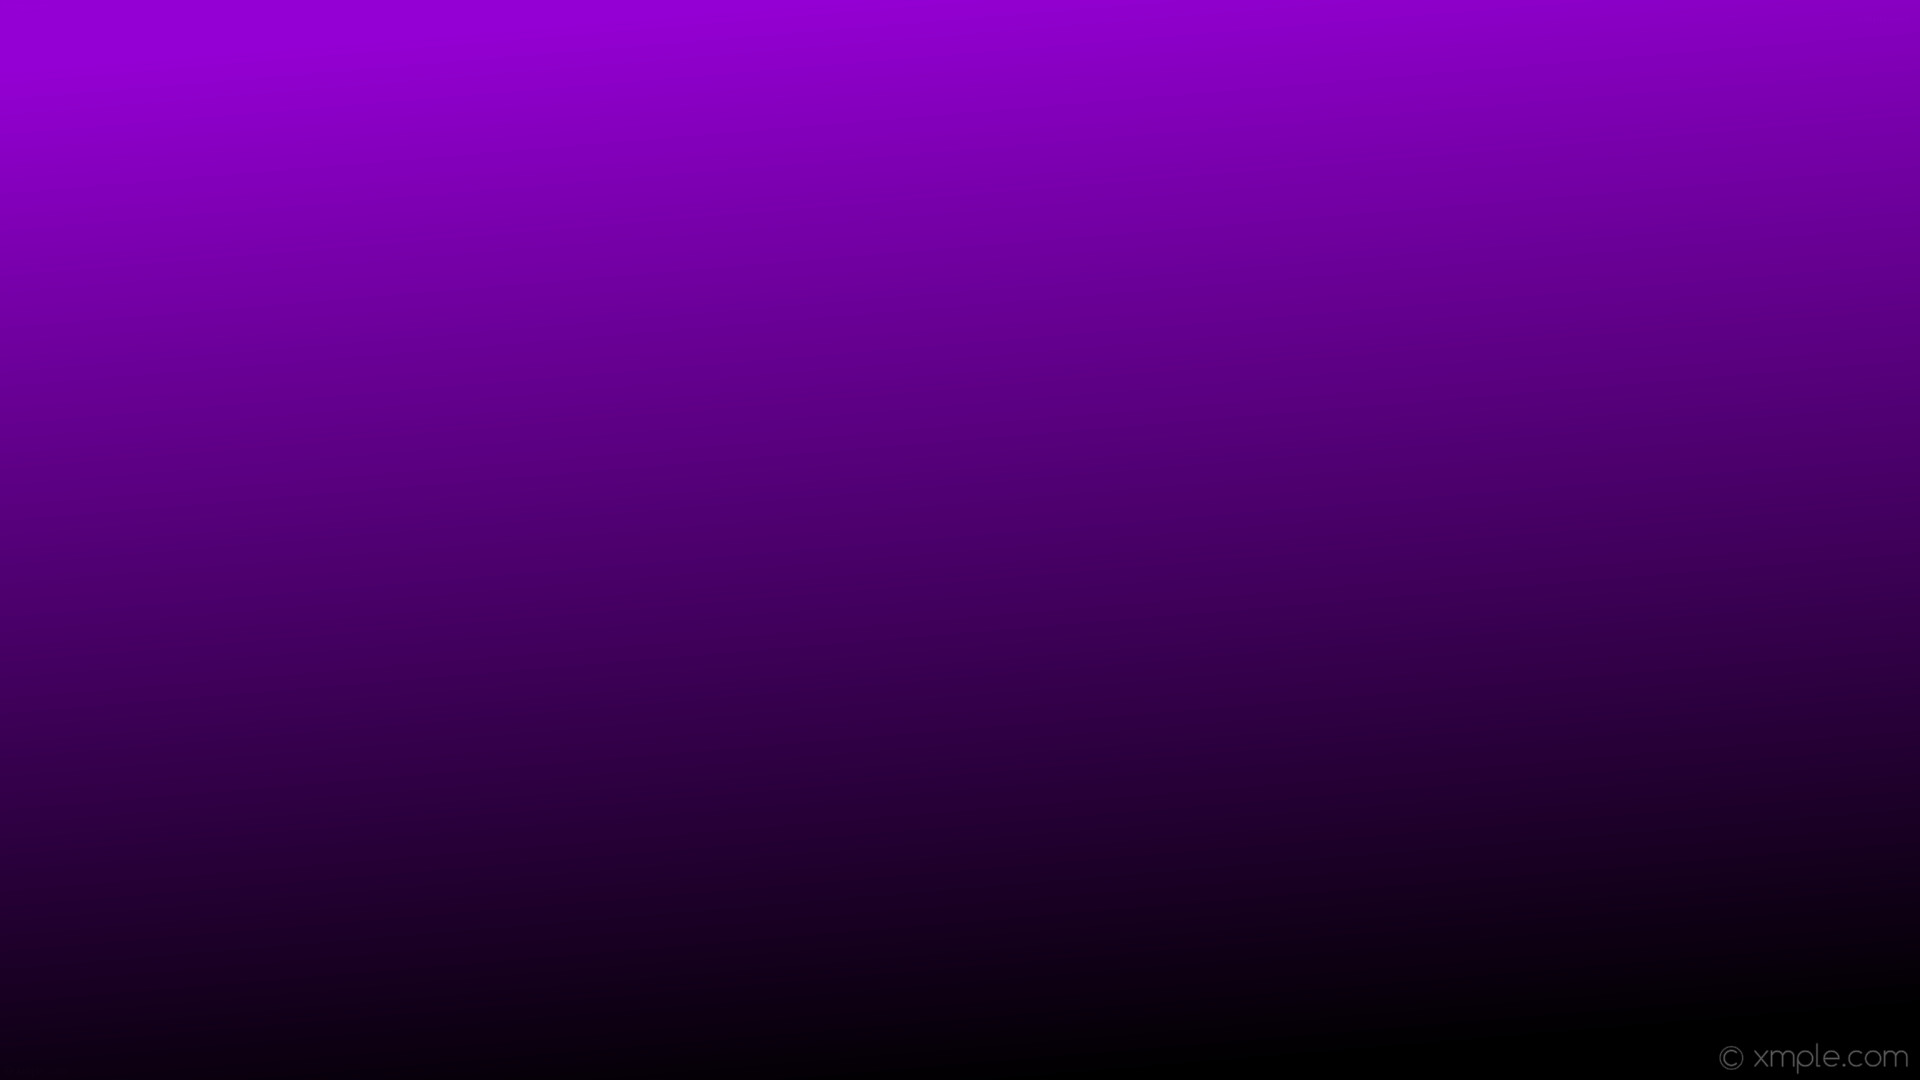 wallpaper purple black gradient linear dark violet #9400d3 #000000 105°